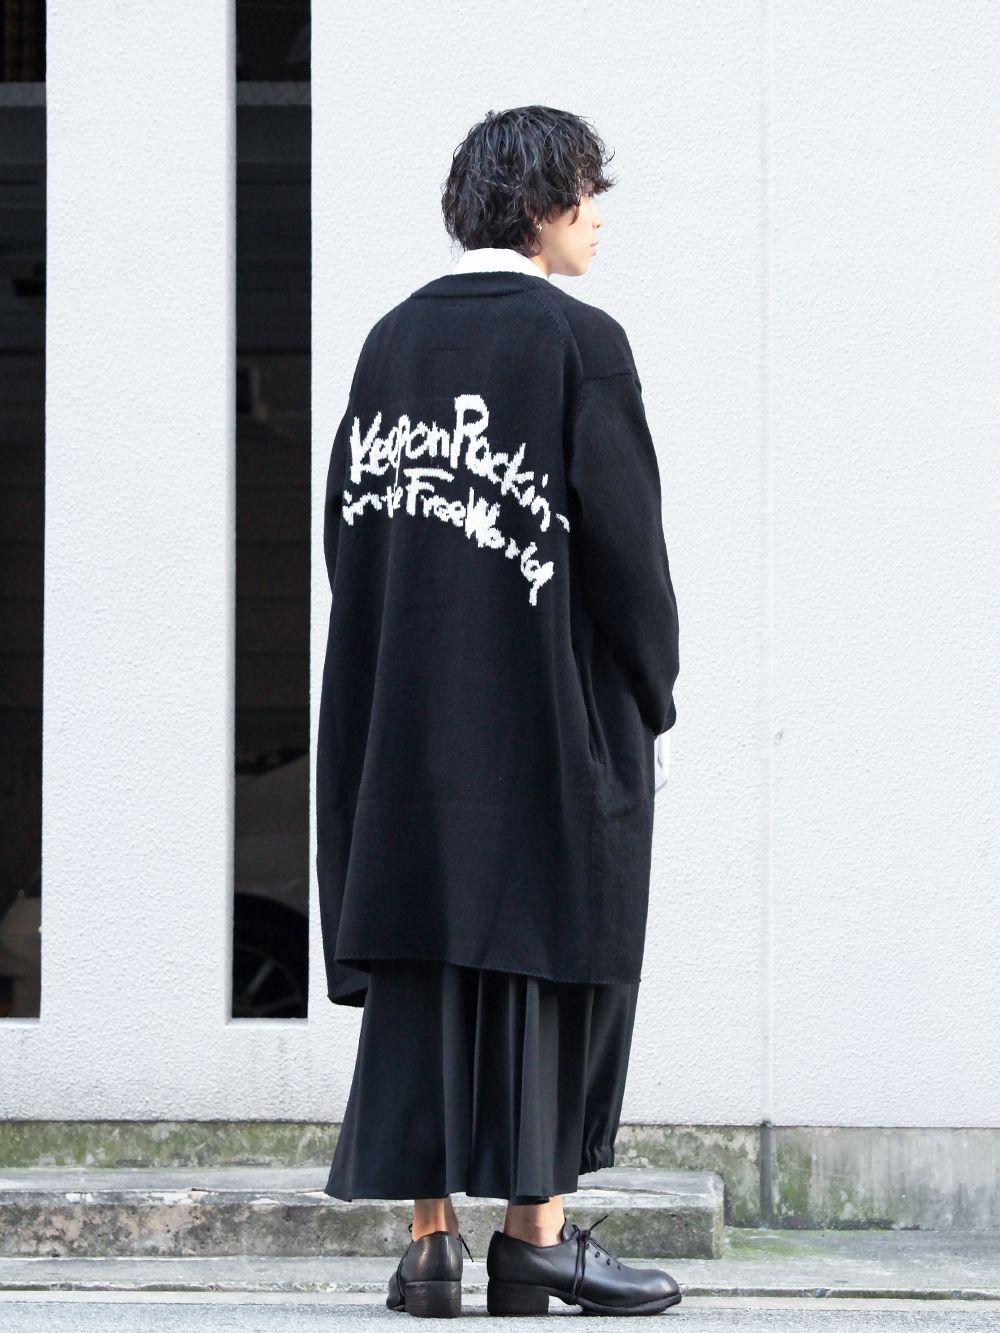 Yohji Yamamoto 19-20AW collection New Arrivals!! - 2-003